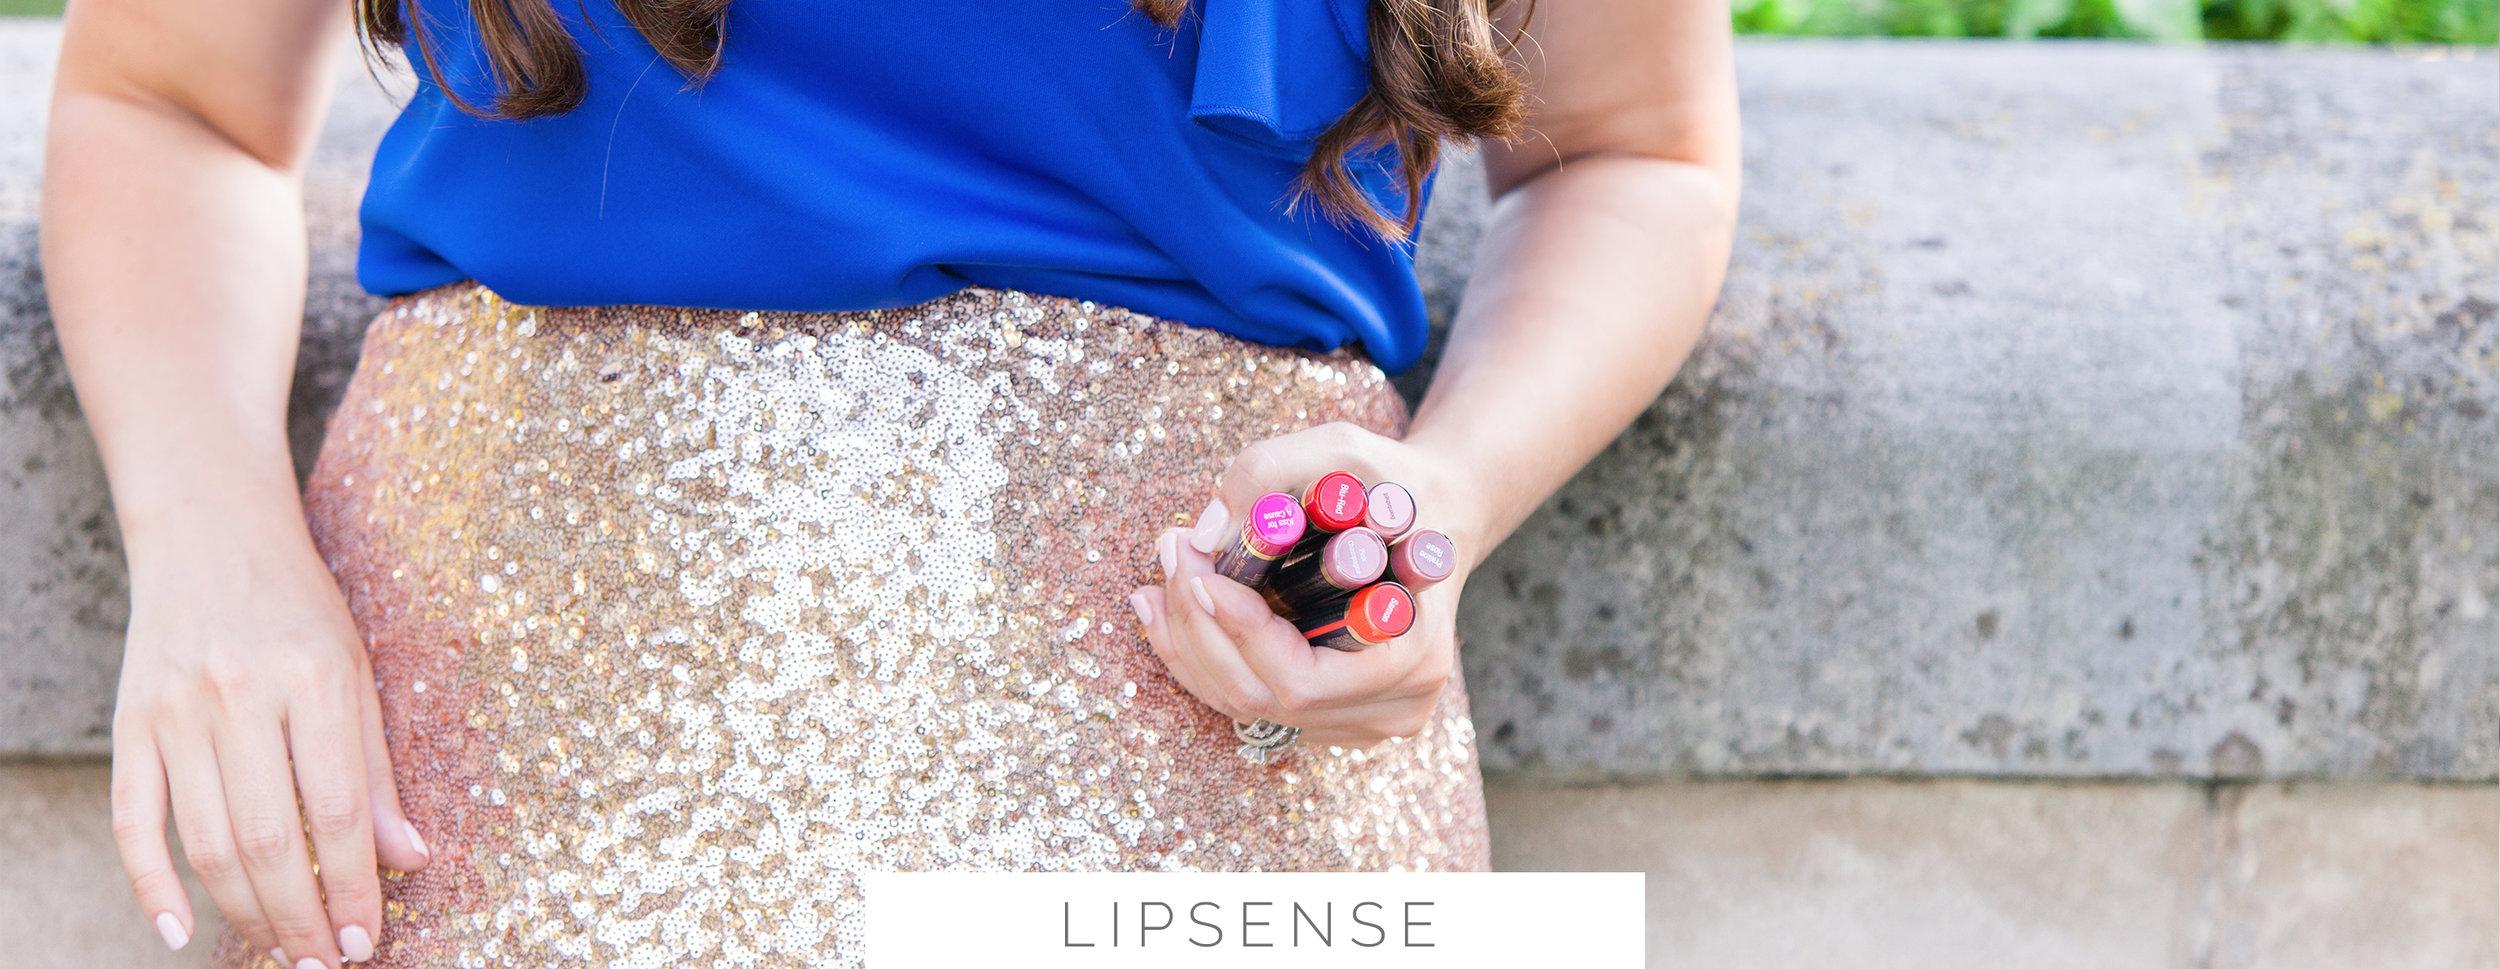 LIPSENSE2.jpg